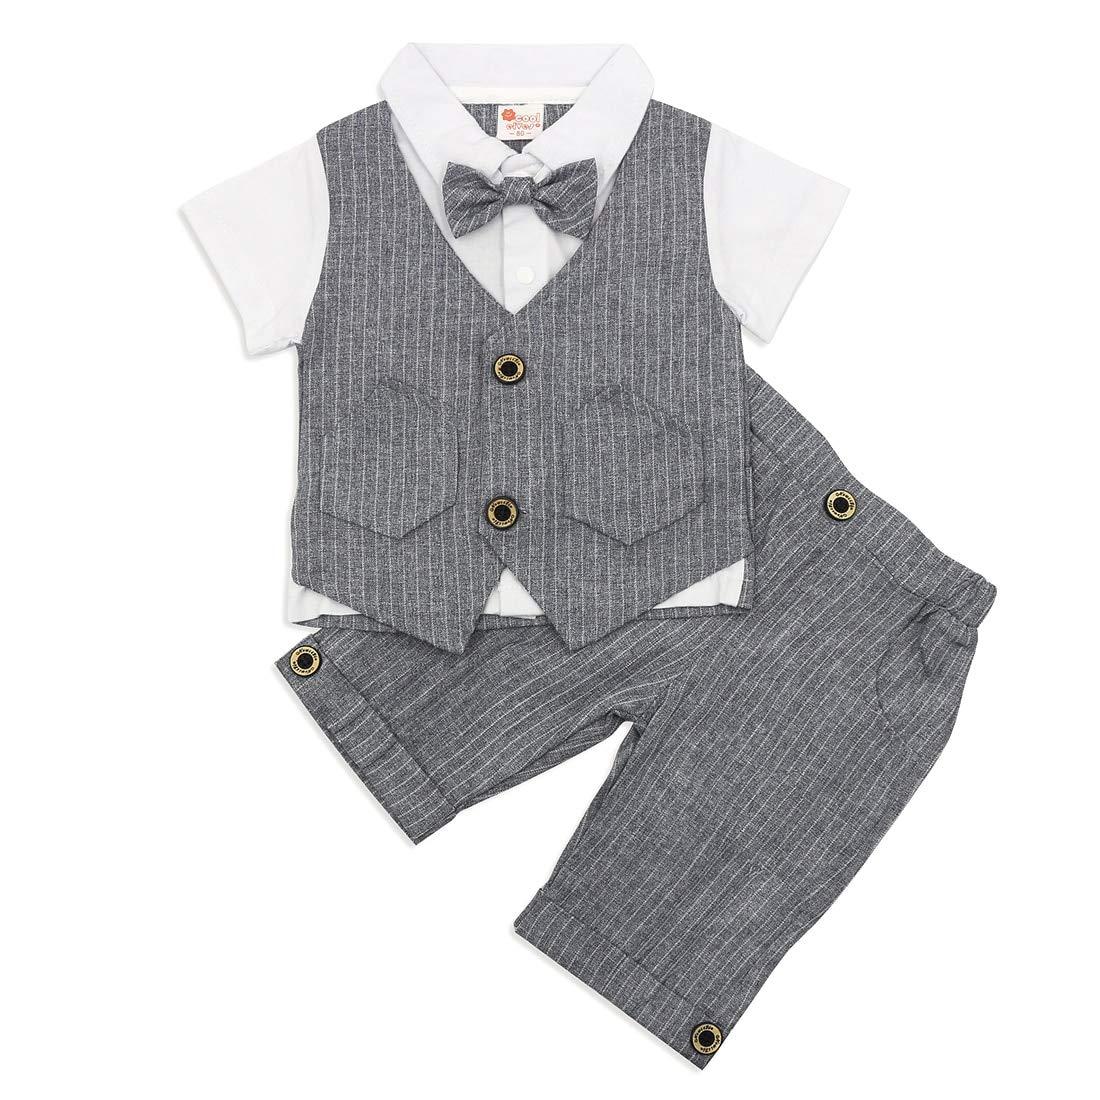 Simplee kids Baby Boy Gentleman Suit Wedding Formal Tuxedo Infant Boy Summer Short Sleeve Jumpsuit Romper and Tie Set